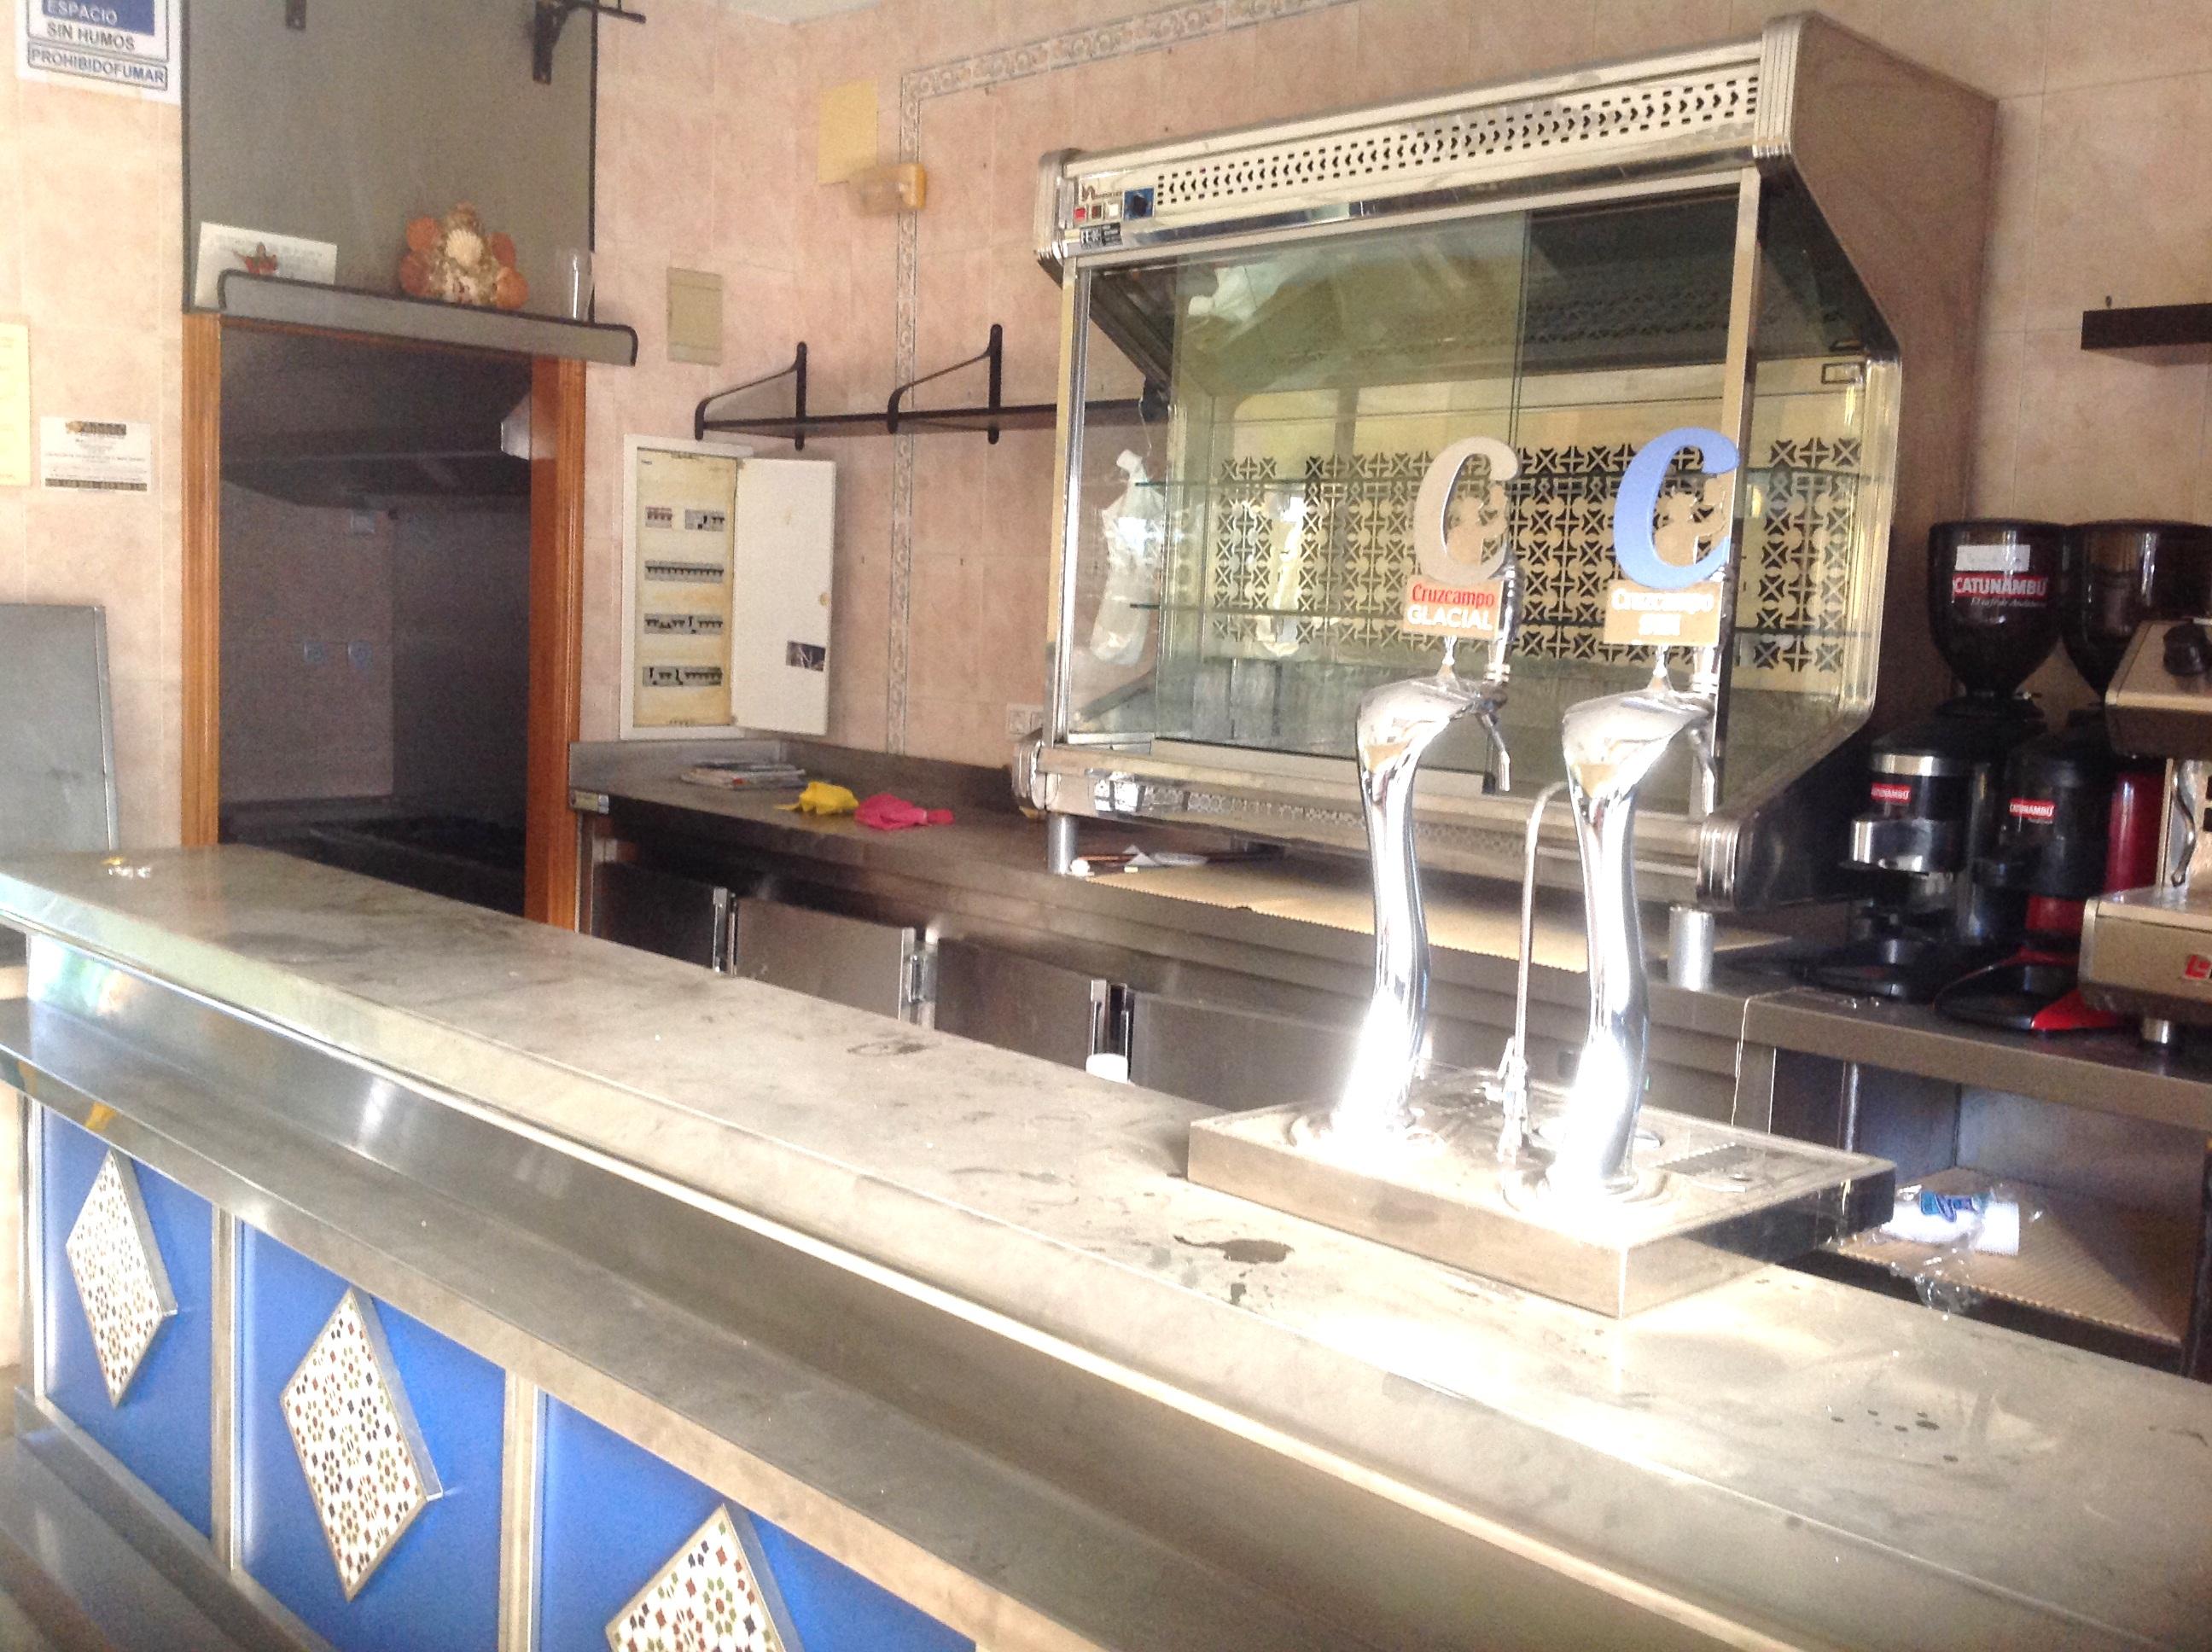 Bar en alquiler en Sevilla, con buena cocina